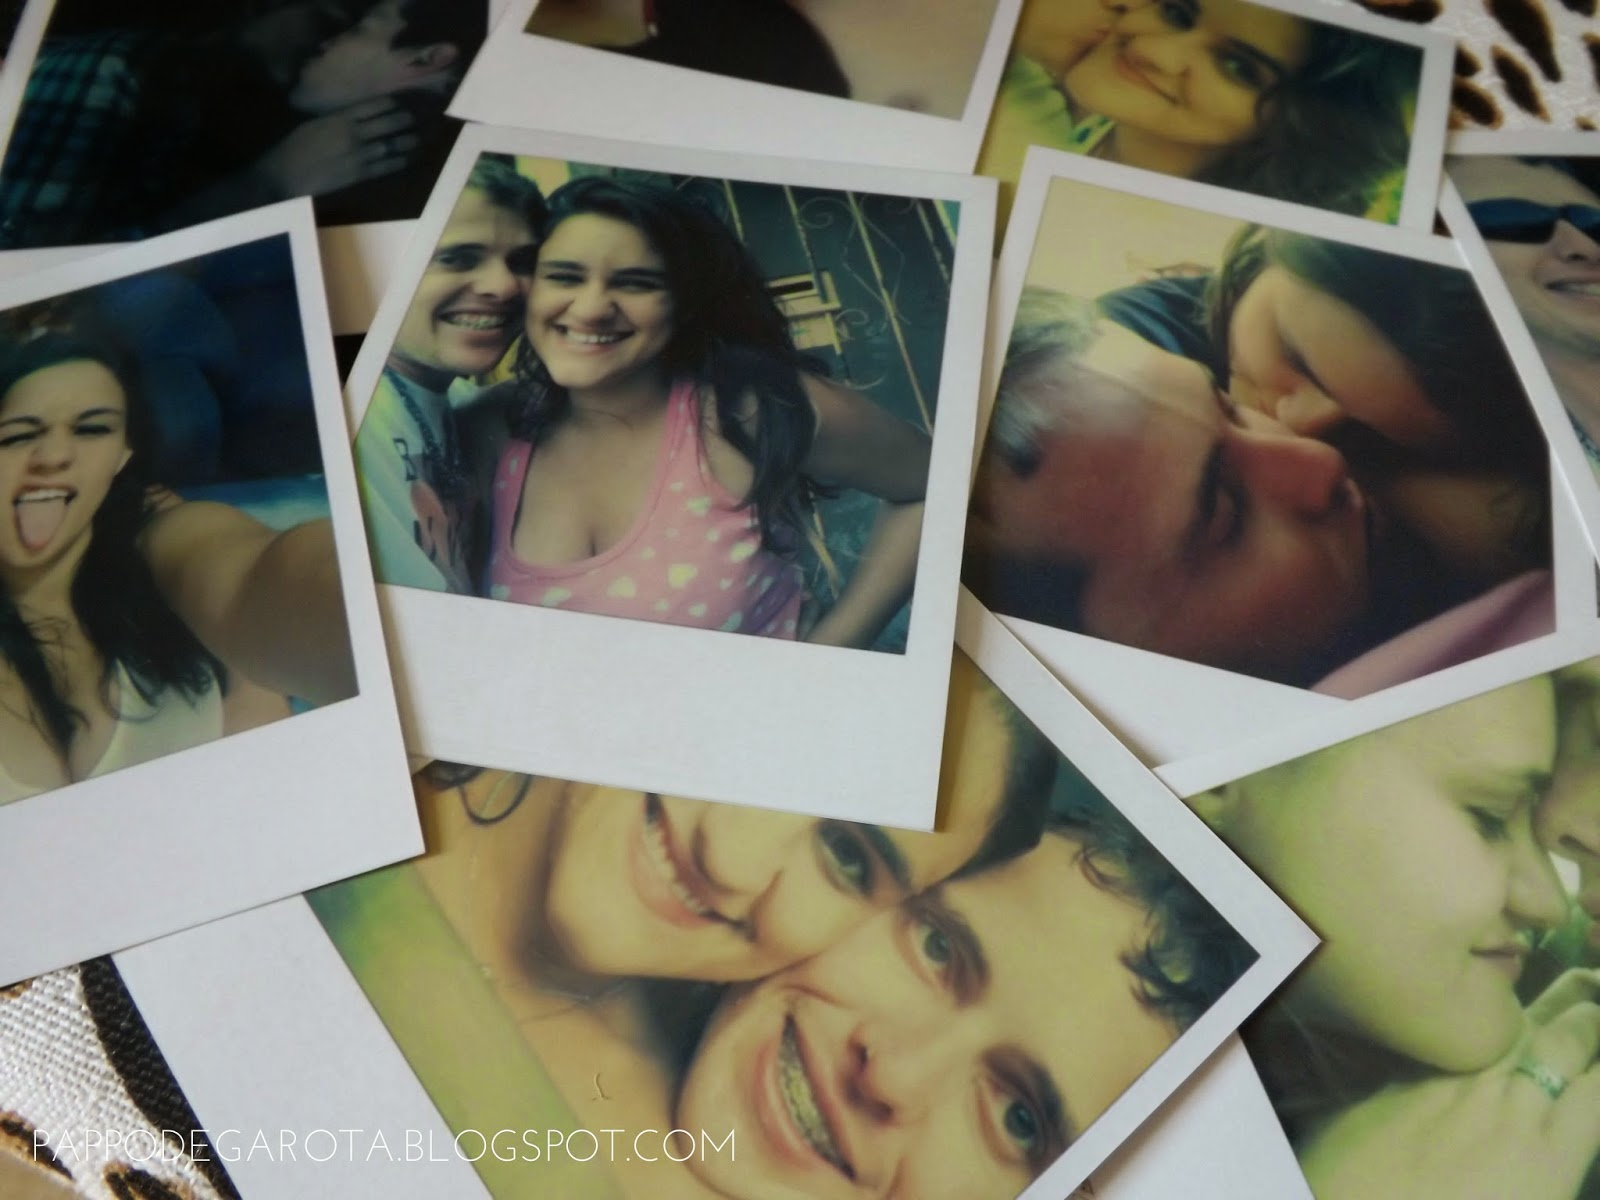 Revelando fotos Polaroid.